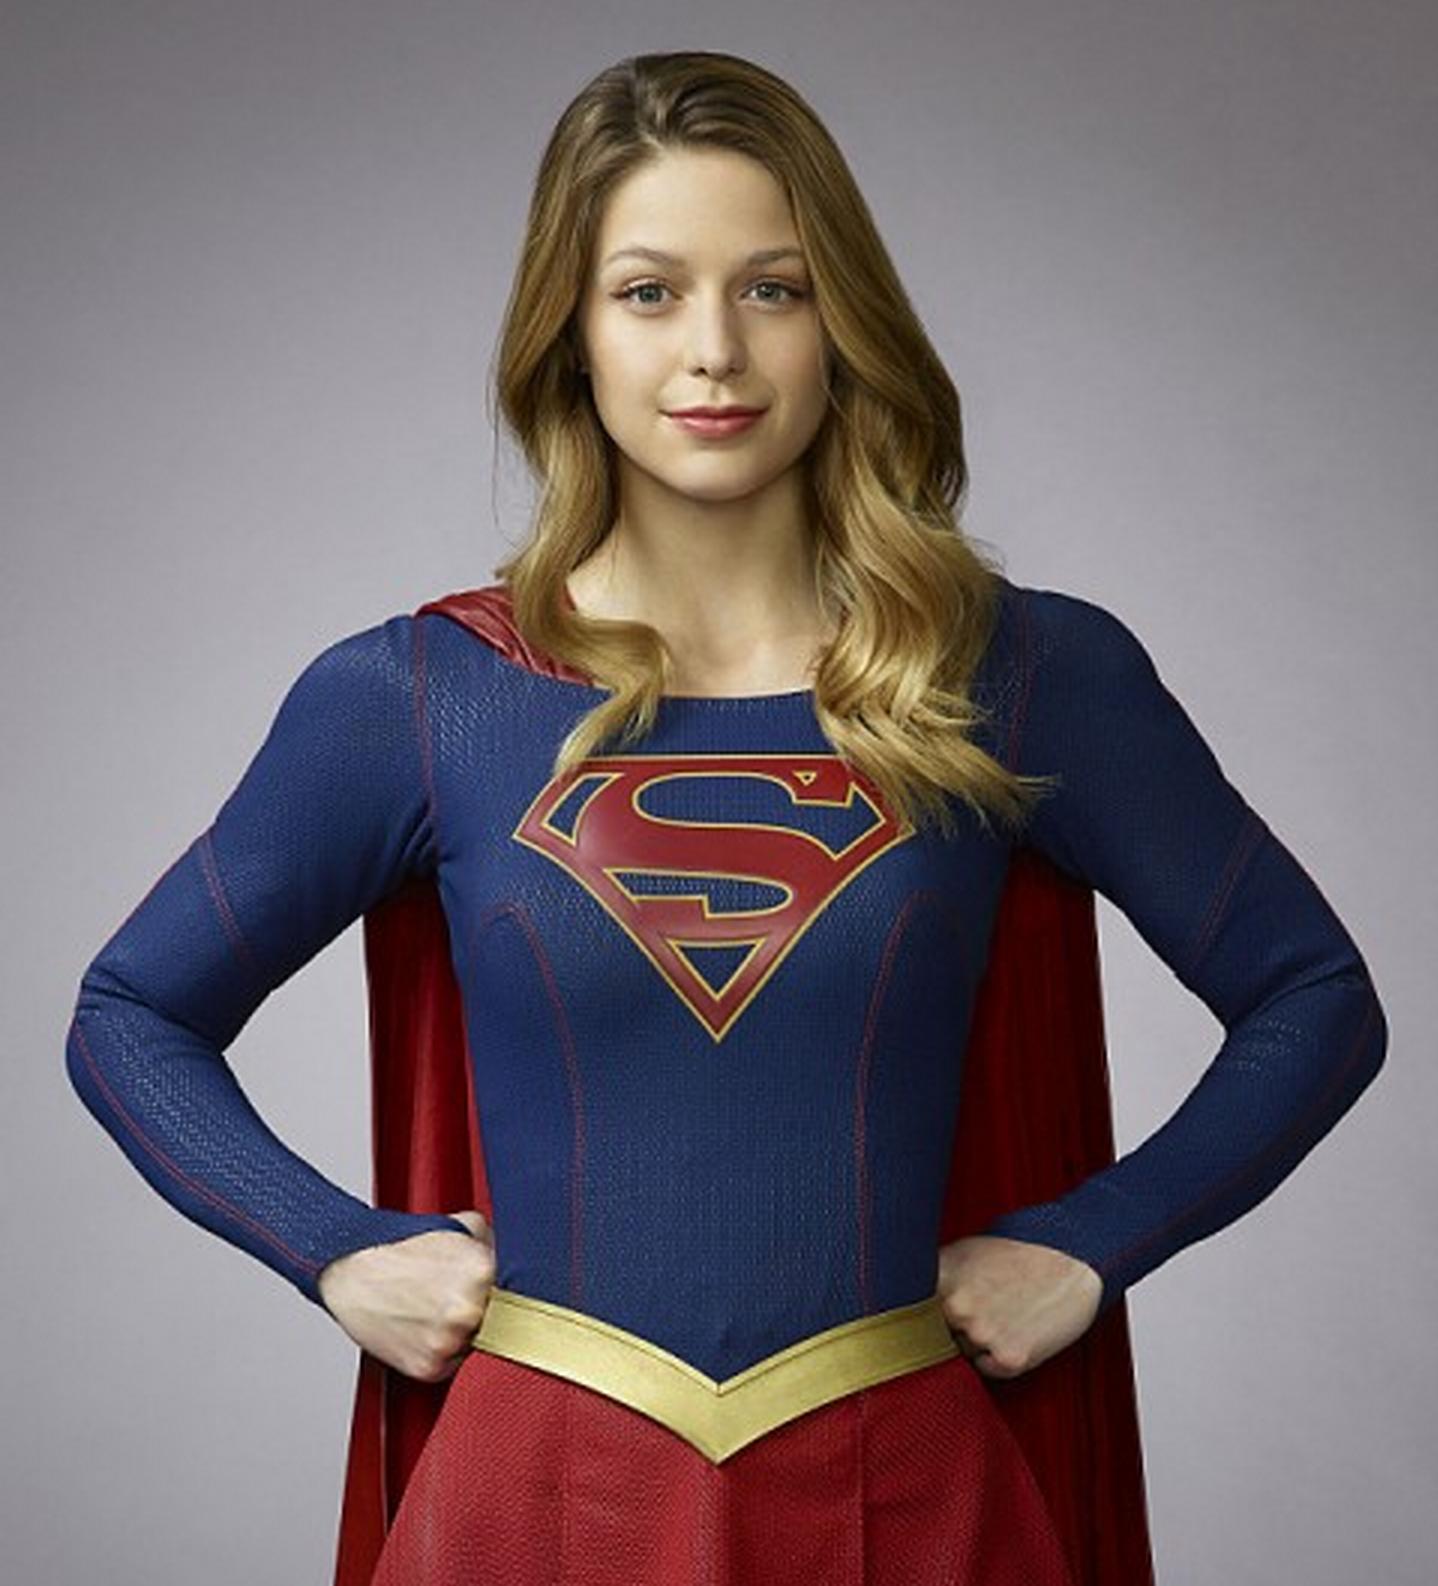 fotos de supergirl imagenes de la serie de supergirl gratis. Black Bedroom Furniture Sets. Home Design Ideas